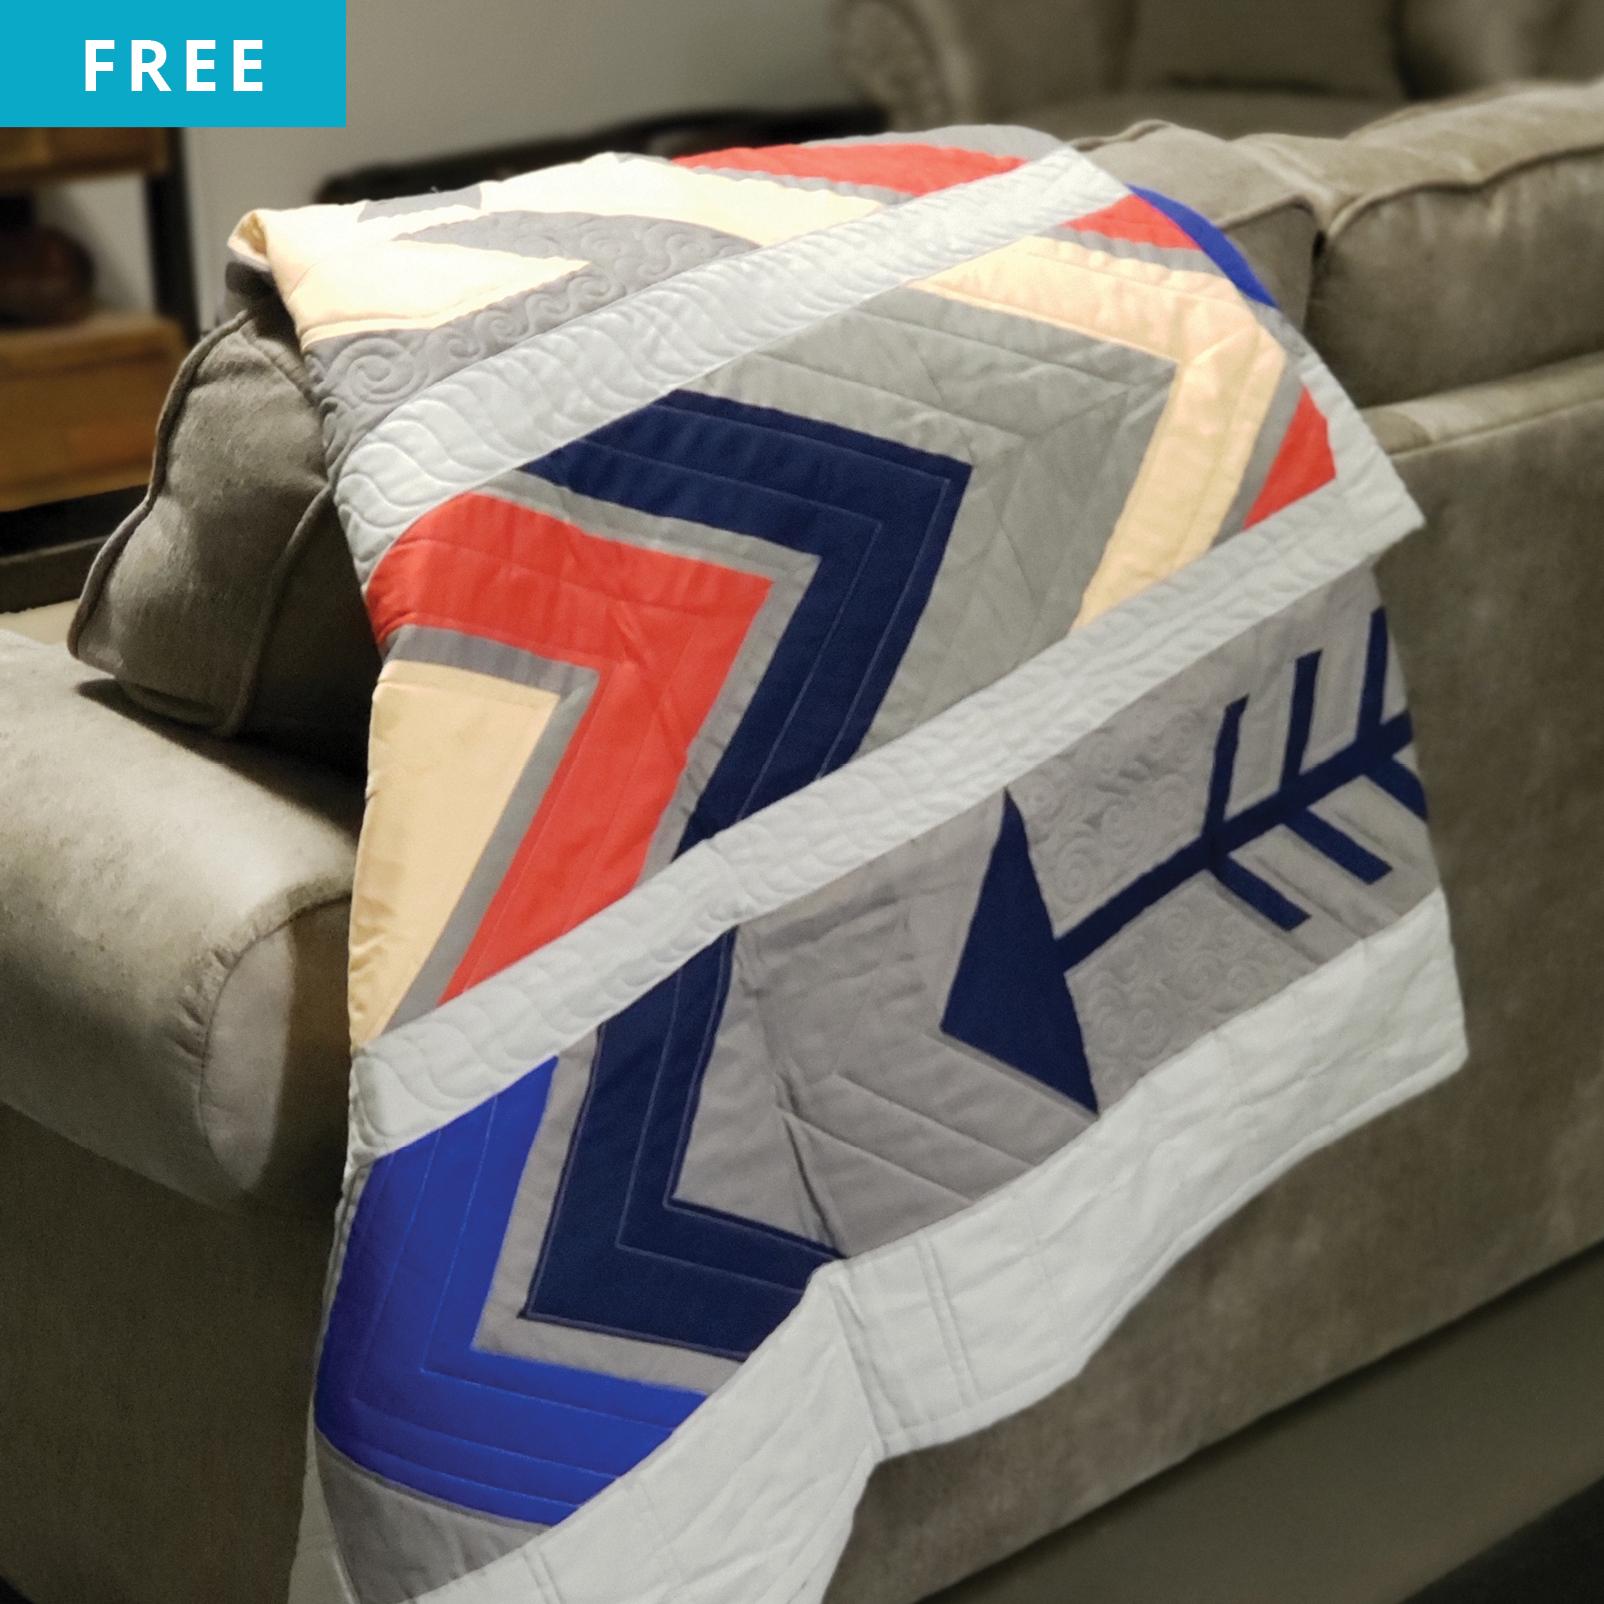 Free Quilt Pattern - Arrows Quilt